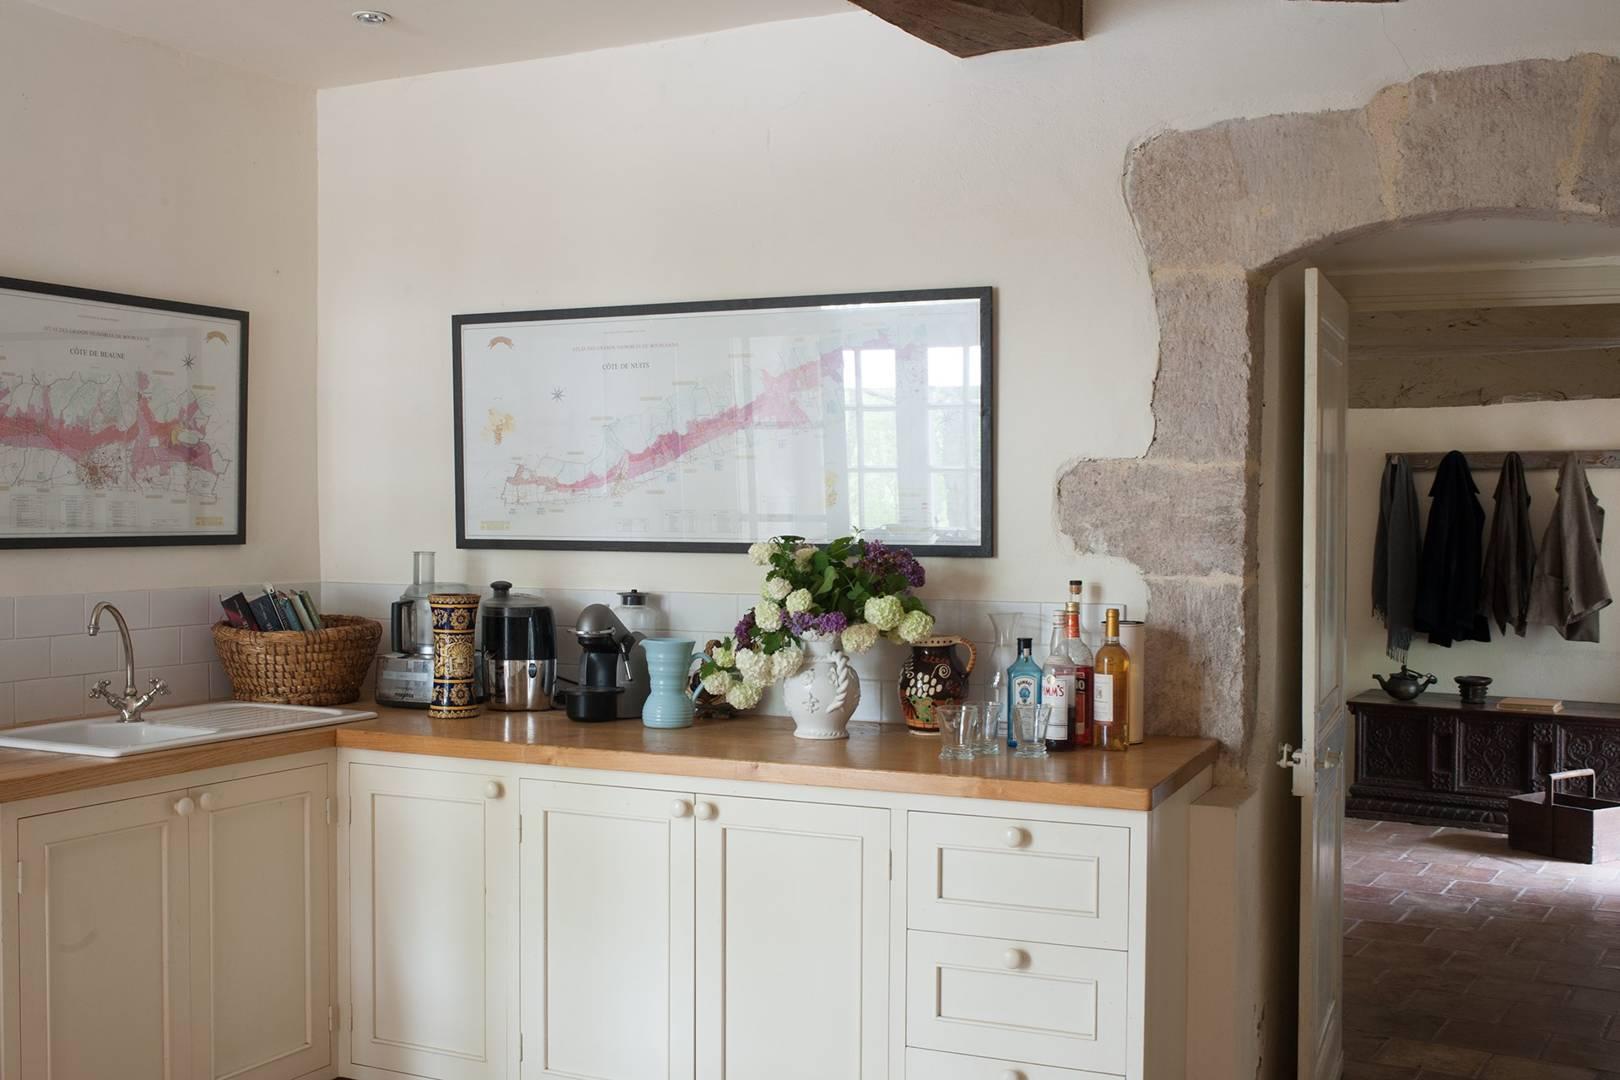 Country Cottage Kitchen in Cream - Kitchen Design Ideas - Images ...